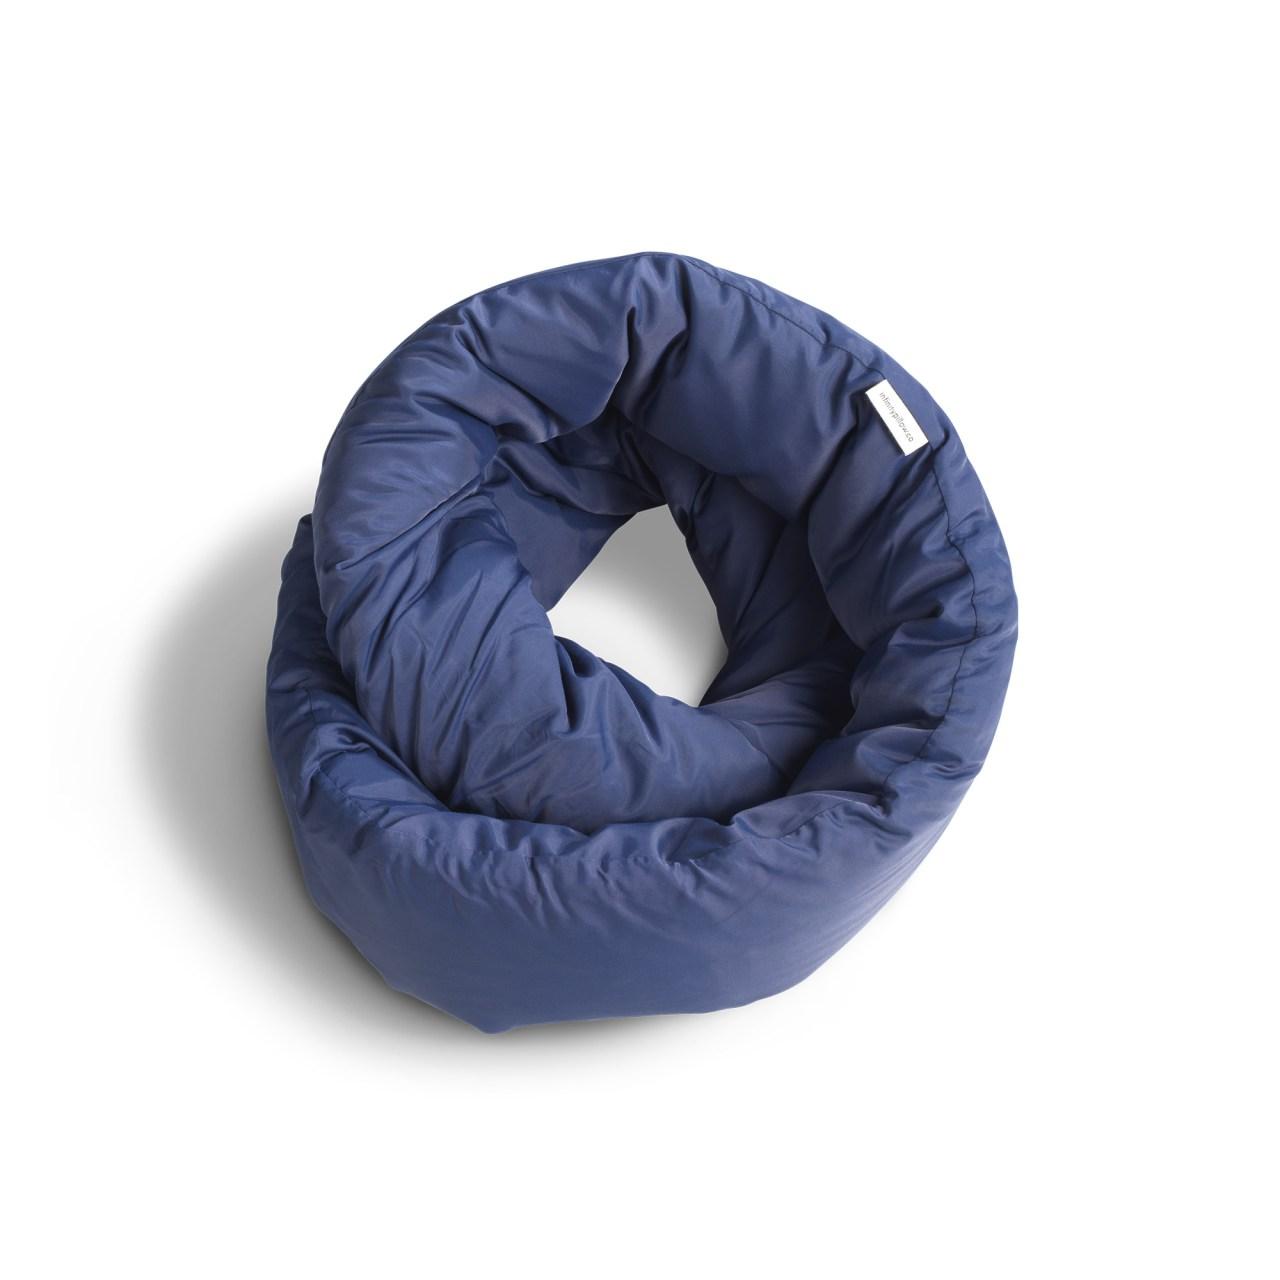 Infinity Travel Pillow